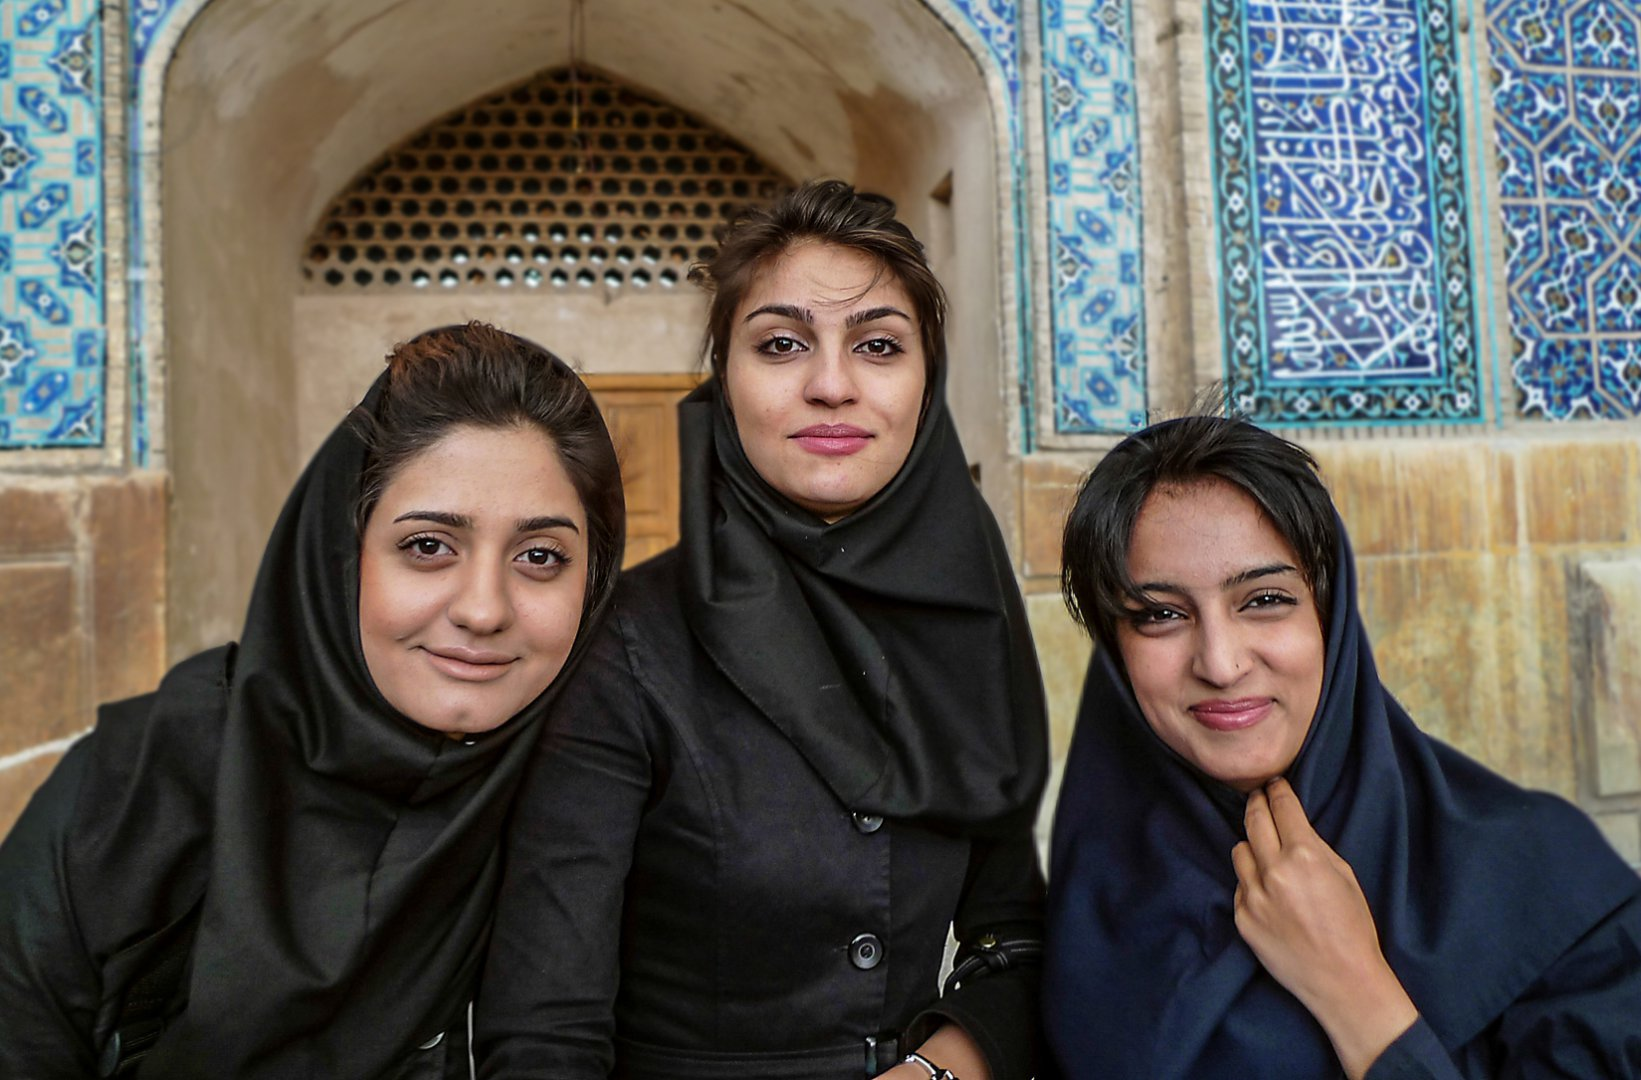 Фото женщин в Омане